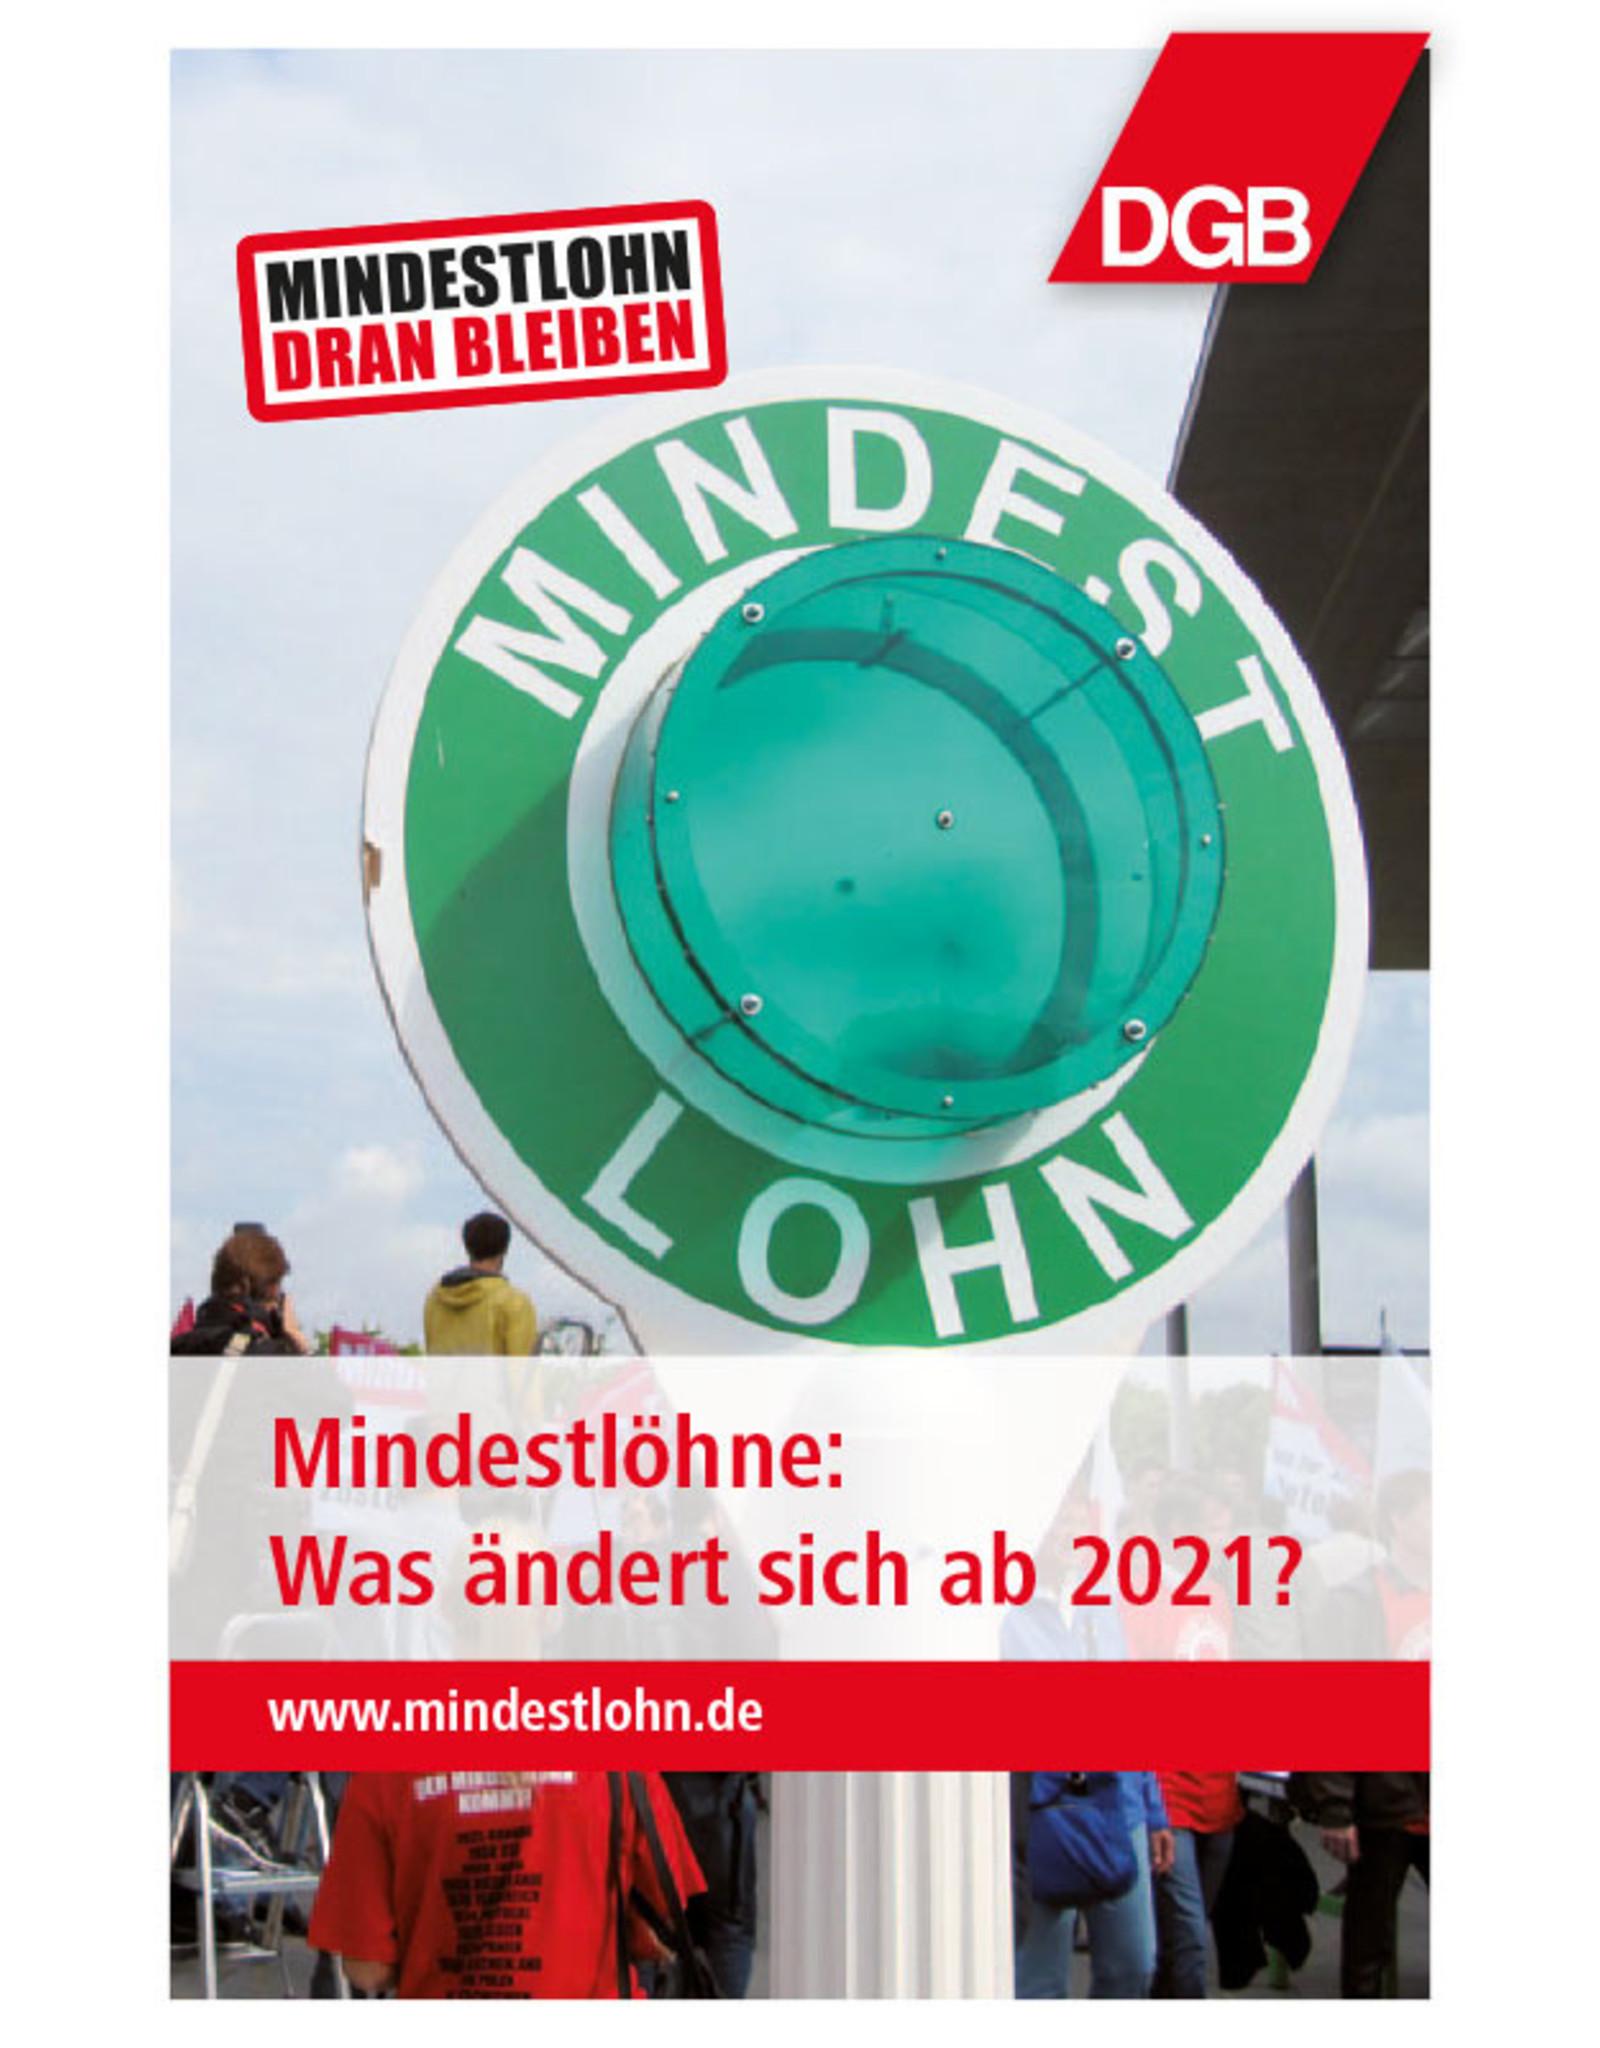 DGB-Broschüre Mindestlohn